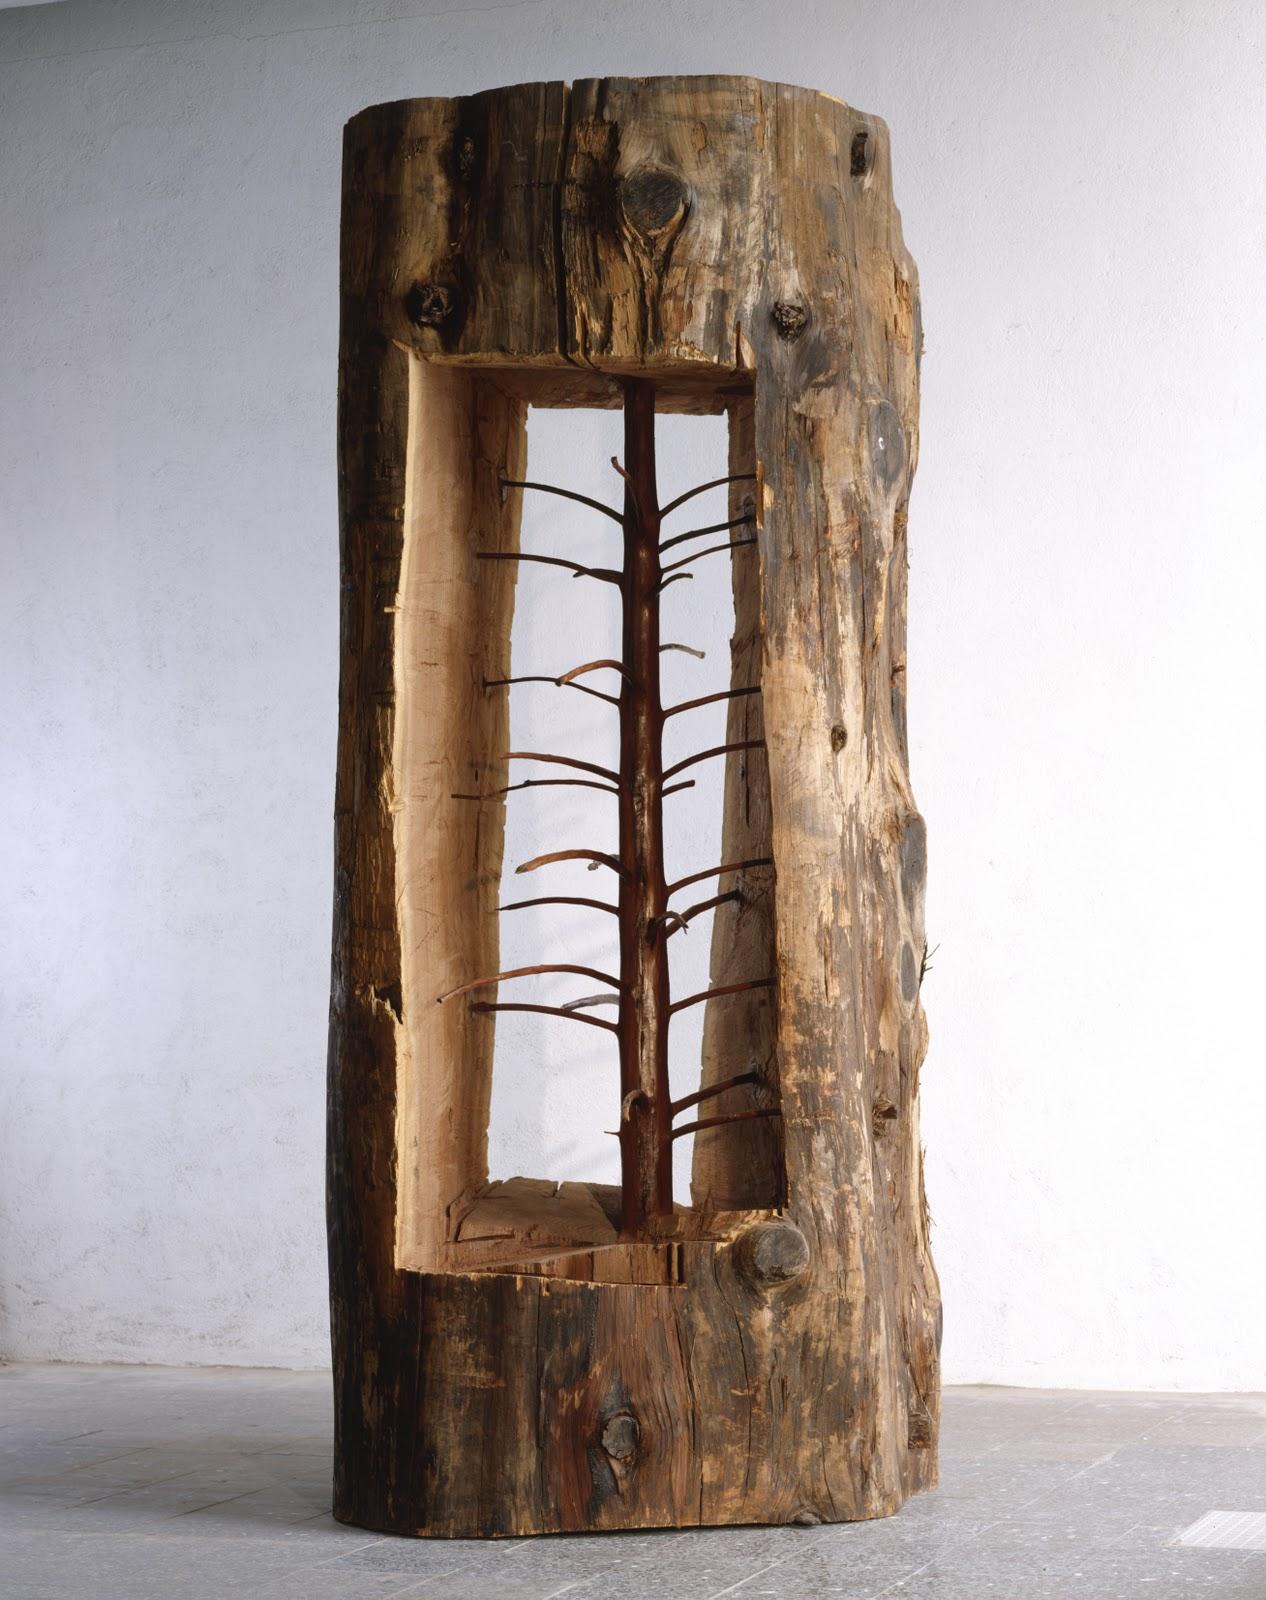 Albero porta -cedro, 2012